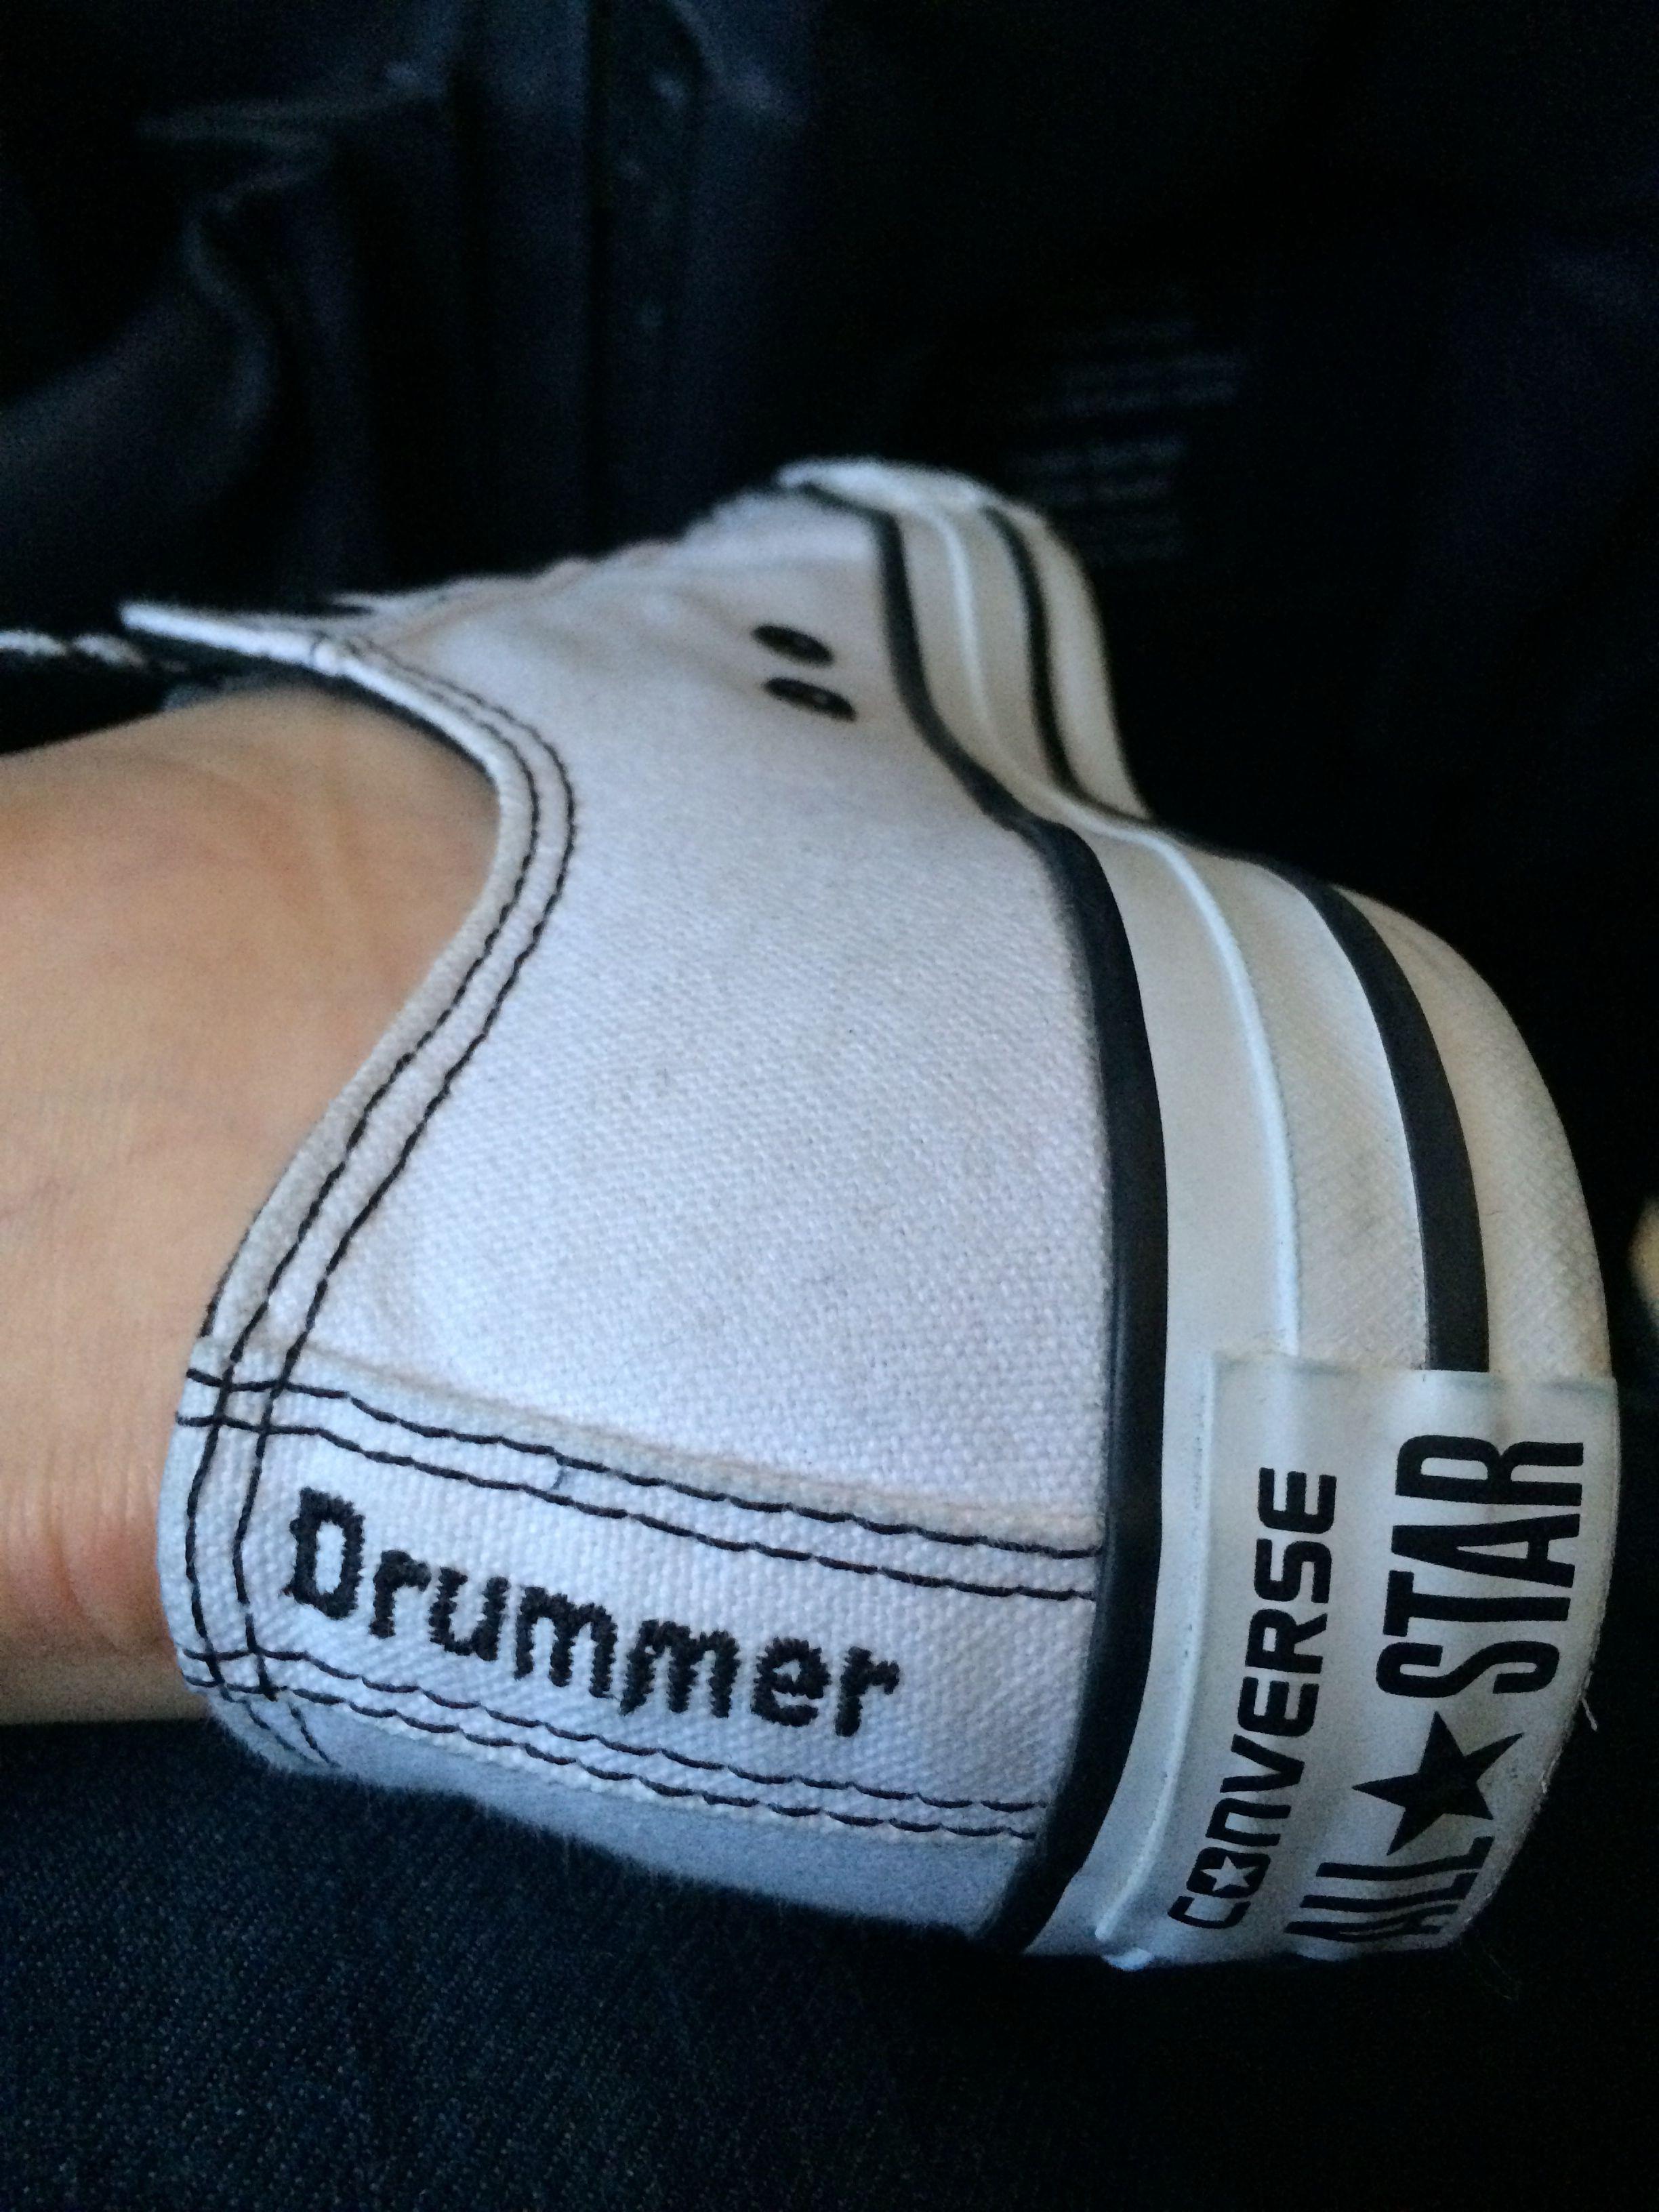 f3a817723399 Custom Design Converse Chuck Taylor Drummer Shoes by Michelle Sandlin